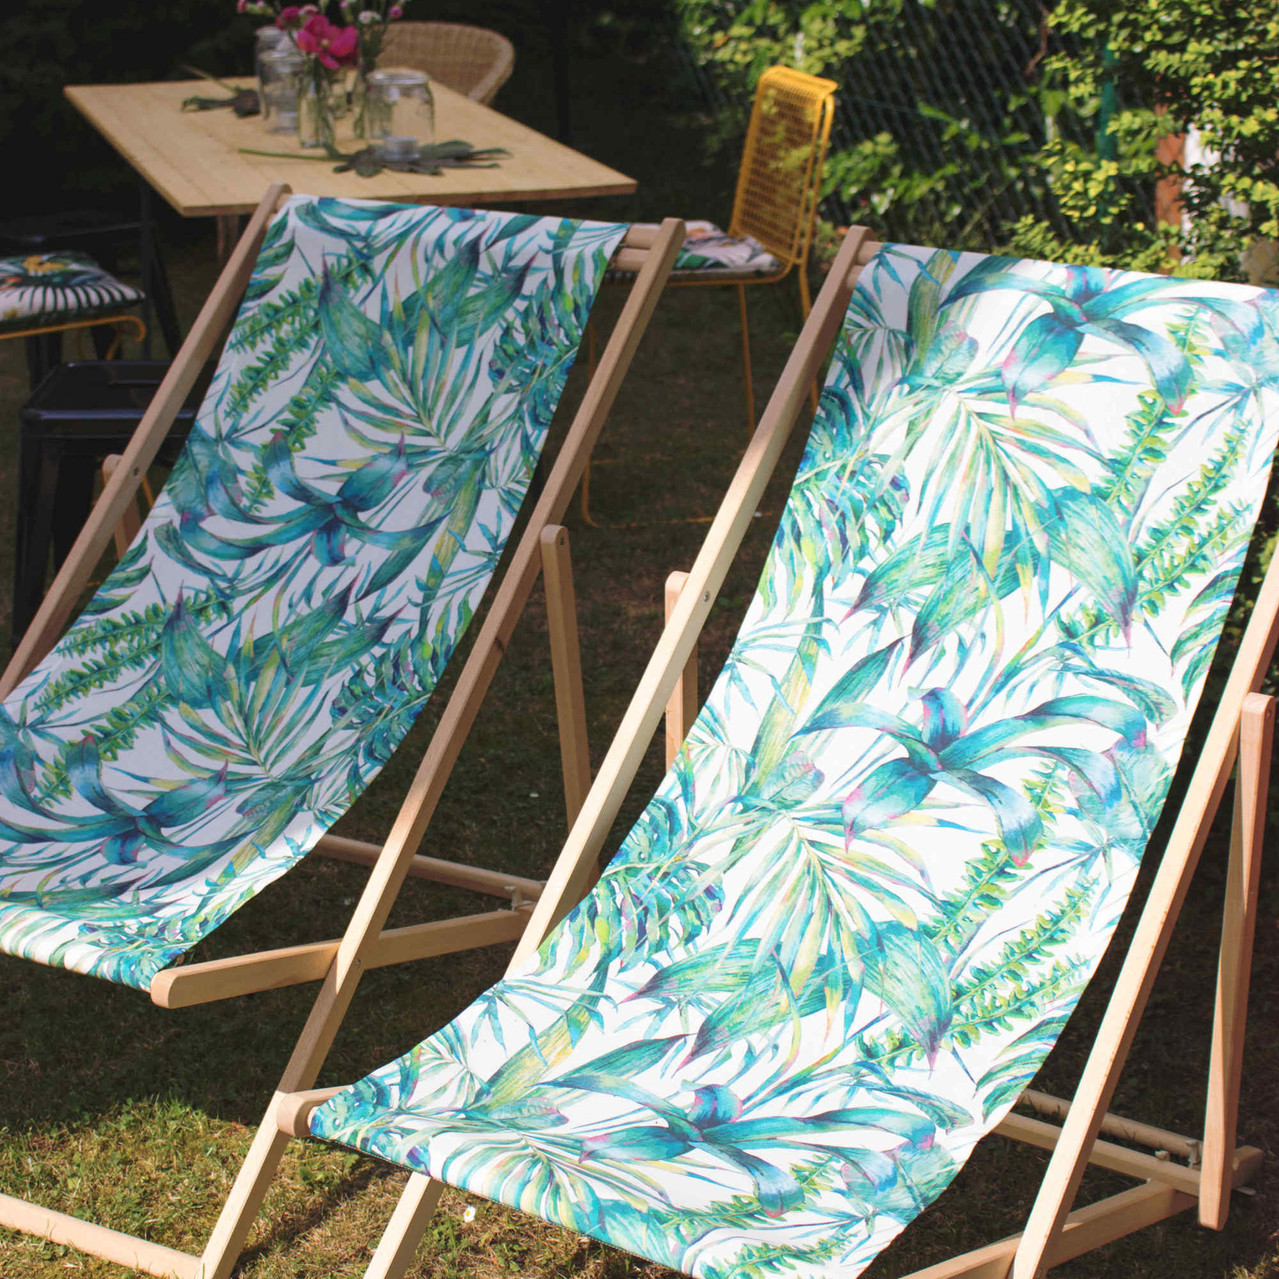 Gartenparty, Miami Style, Sommerfest, Geburtstagsfeier, Deko, Partydeko